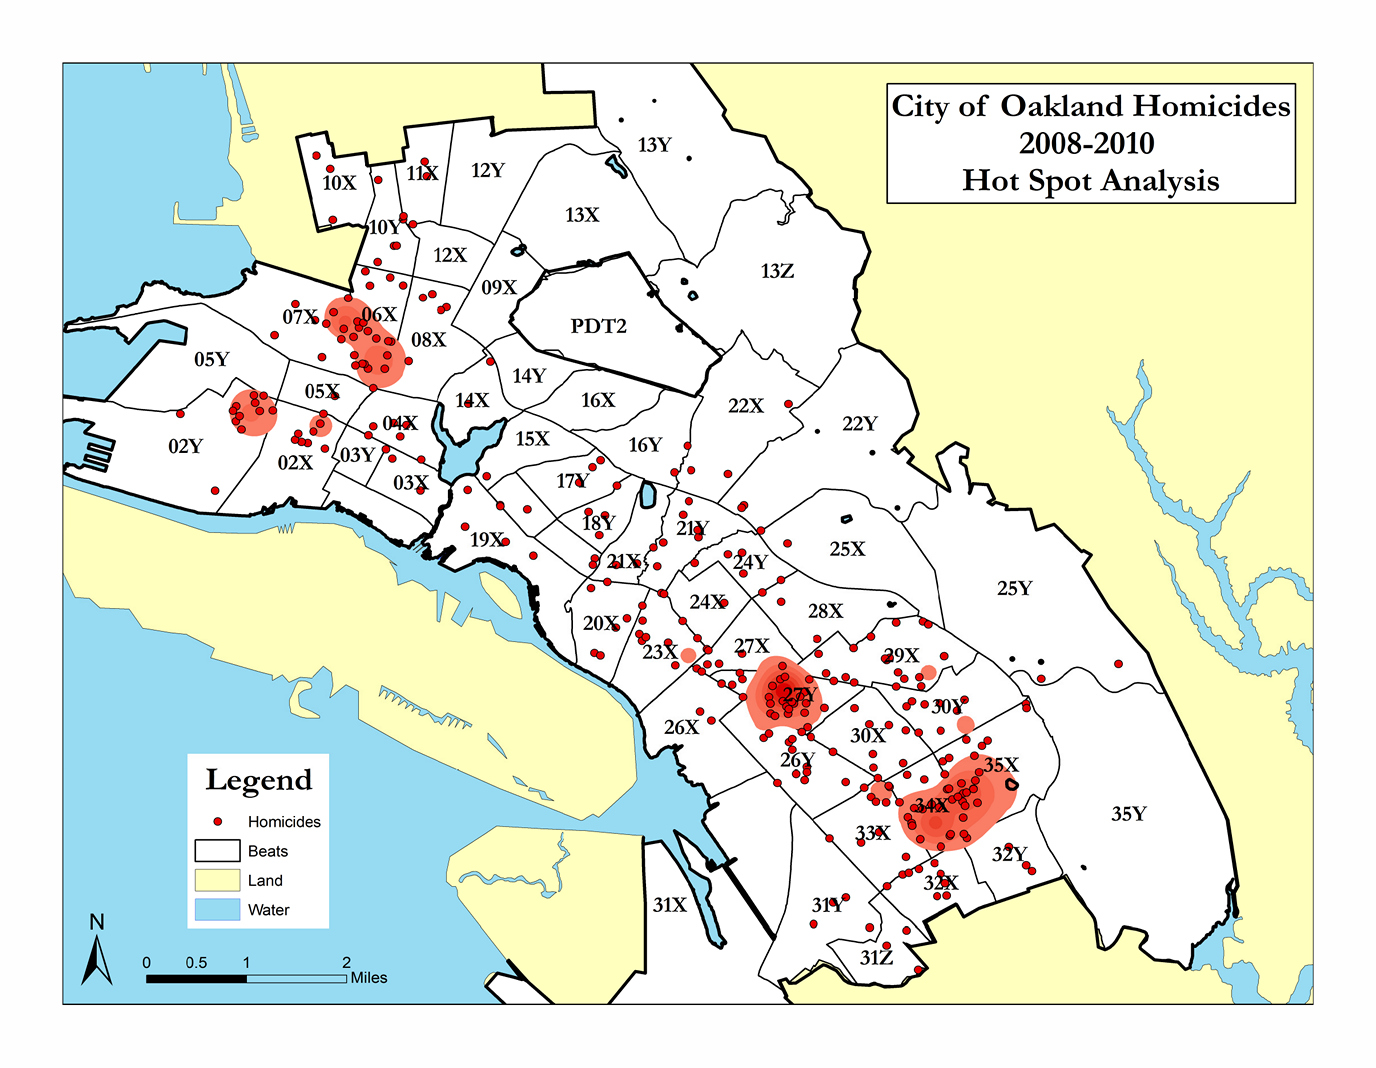 homicides_2008-10_map-1